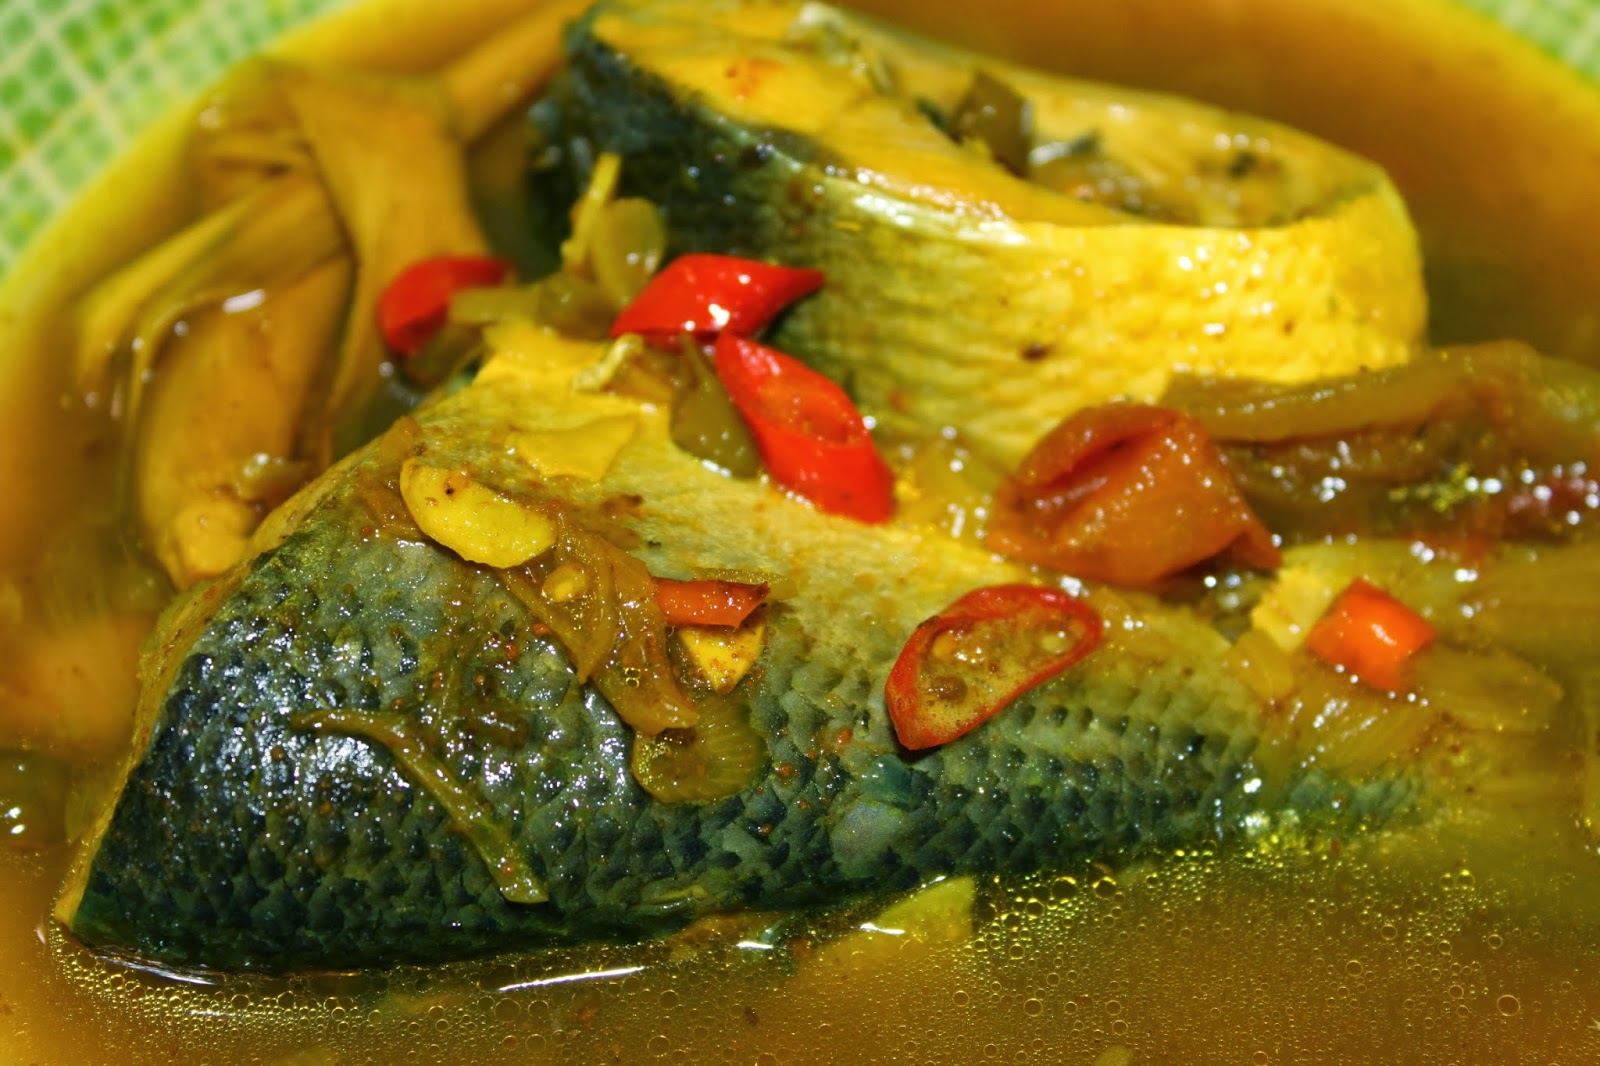 Resep Ikan Bandeng Kuah Kuning - Dapur Lagi